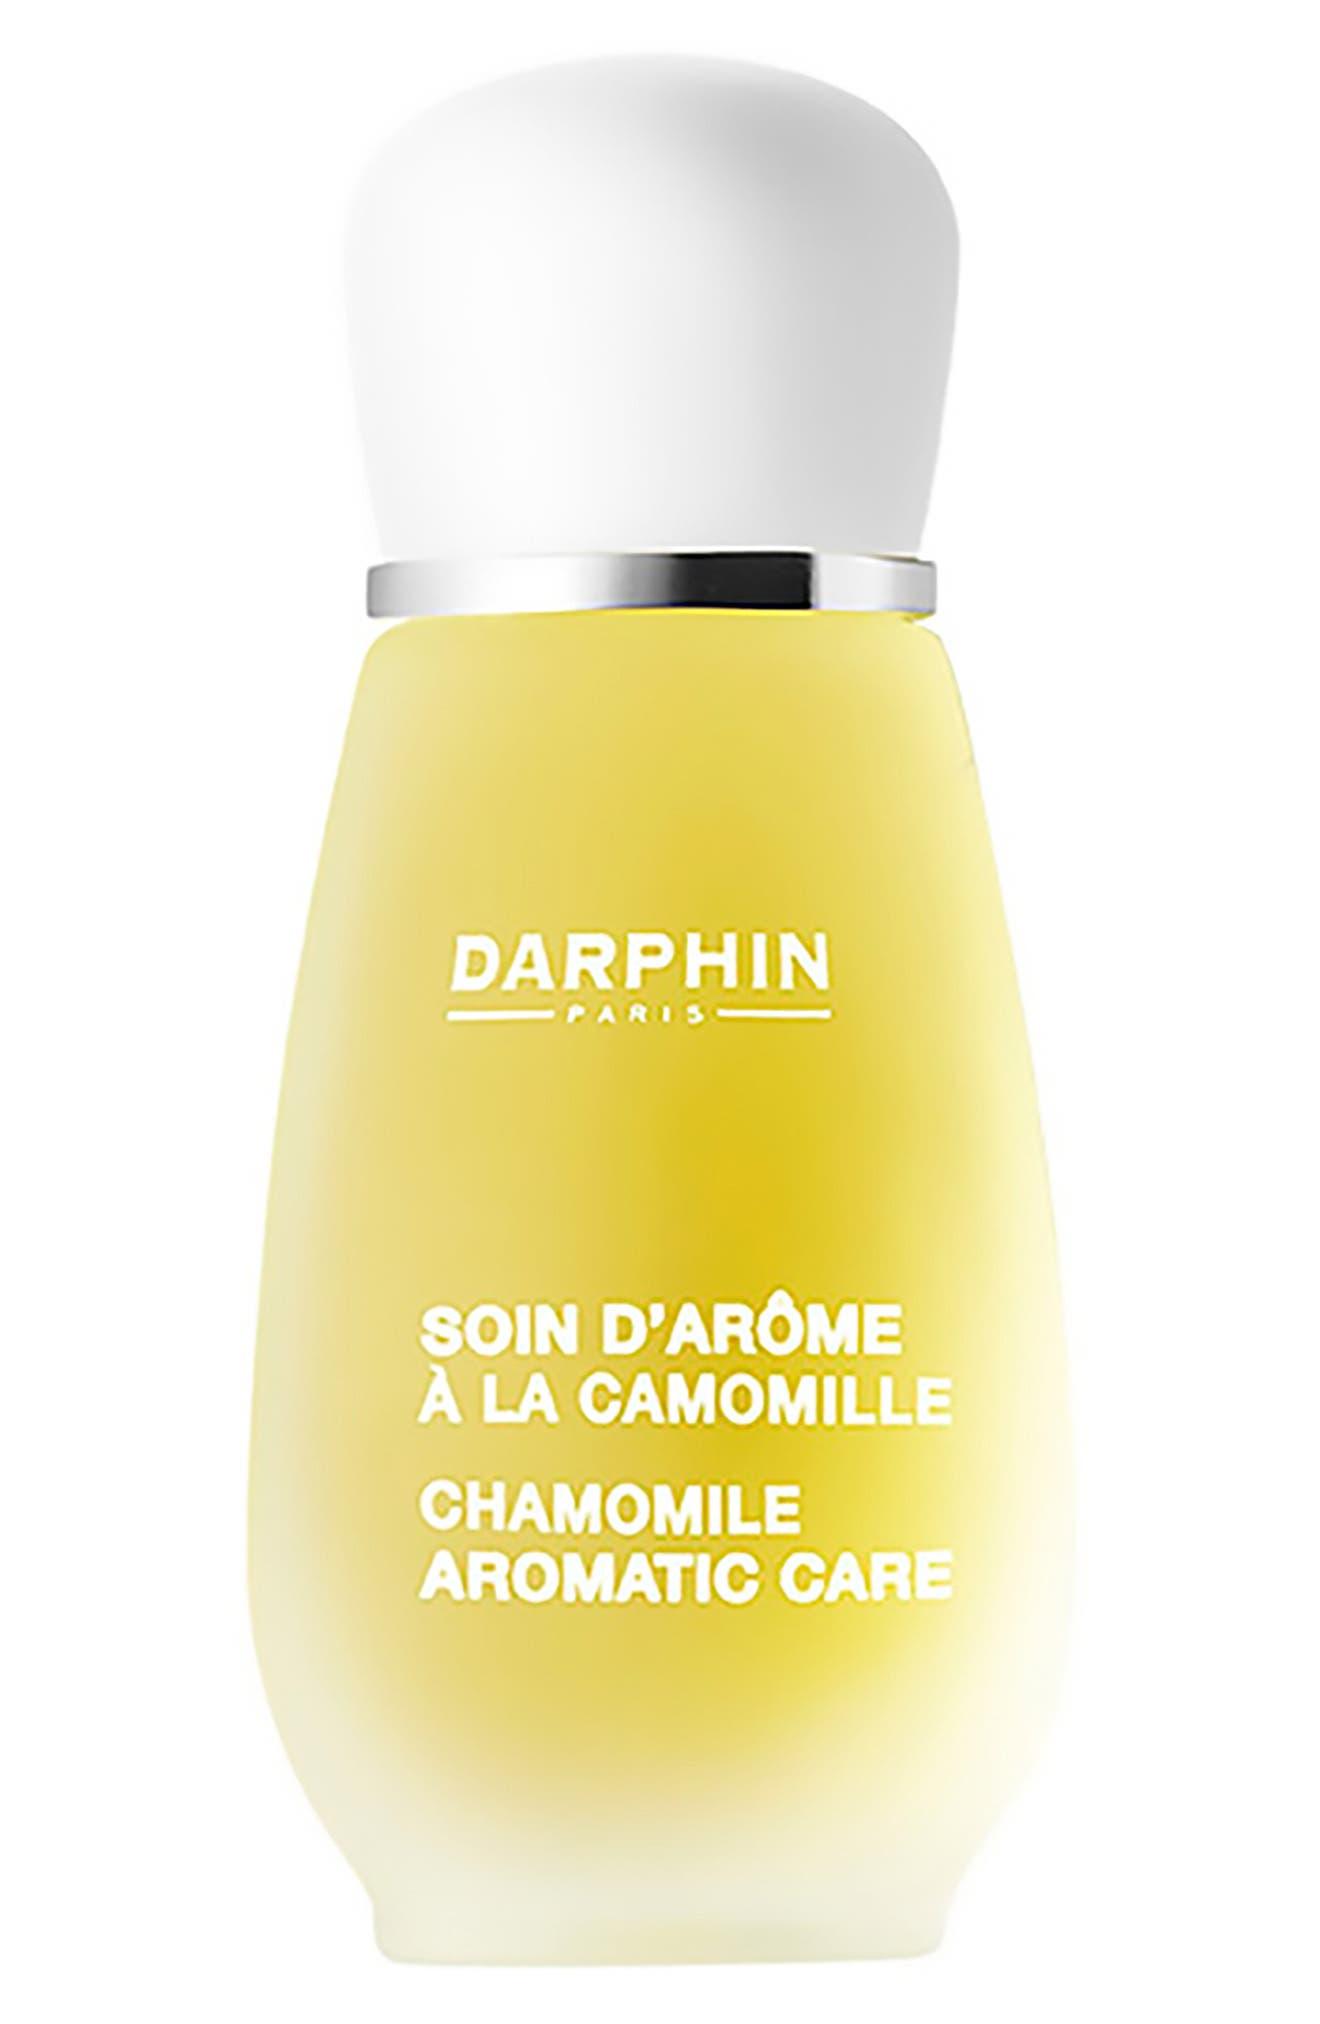 Chamomile Aromatic Care Face Oil